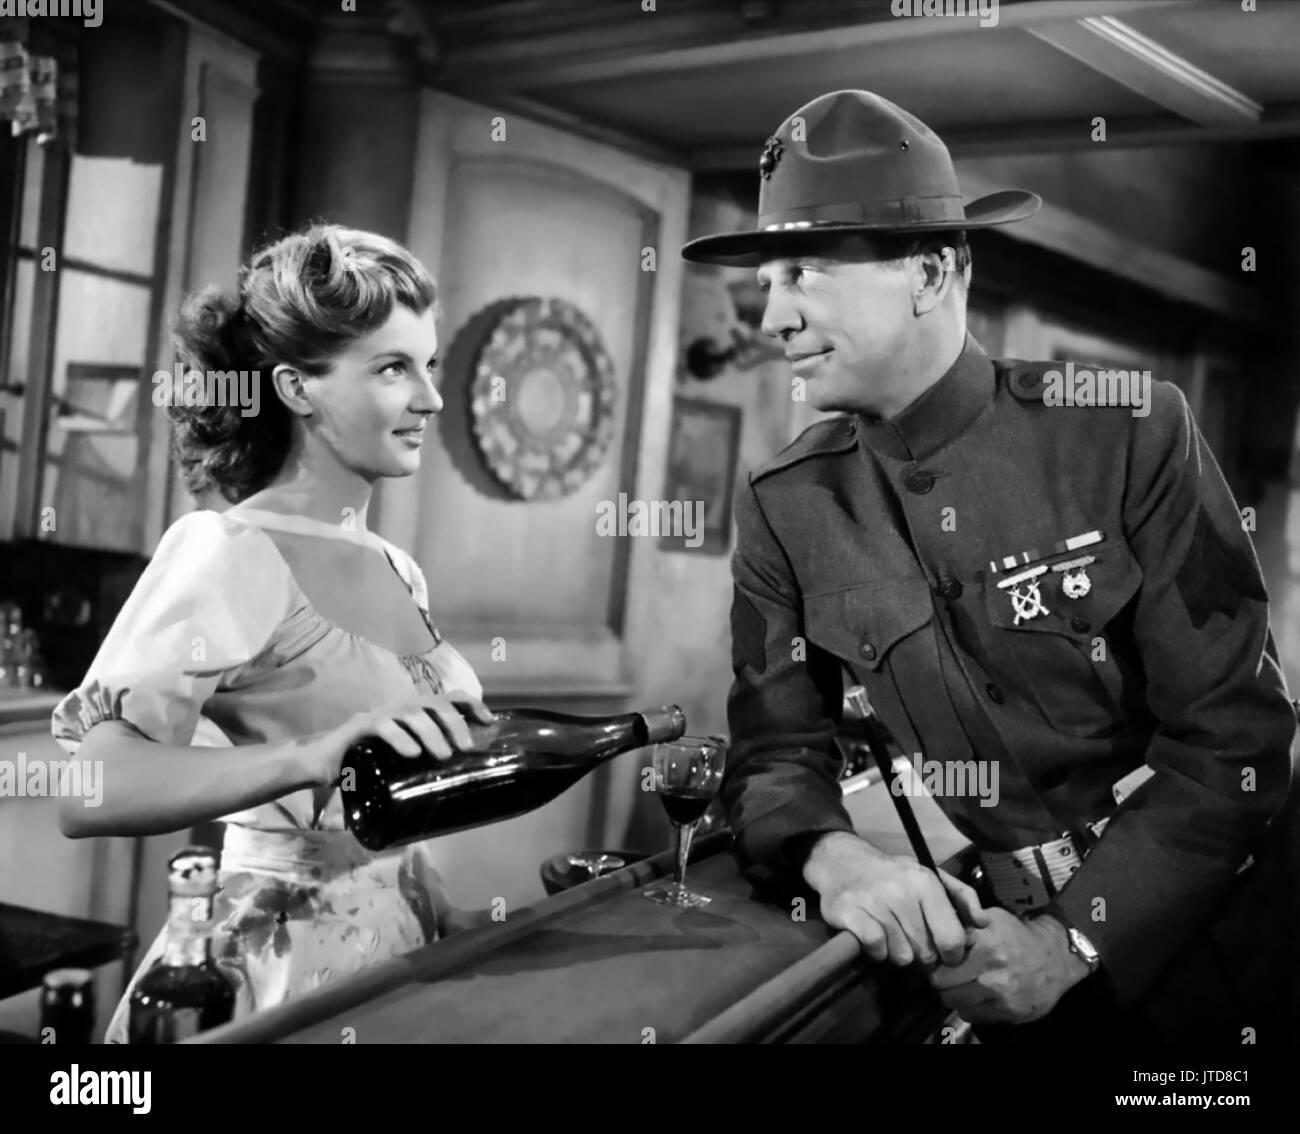 WHAT PRICE GLORY  1952 20th Century Fox film with Corinne Calvet and Dan Dailey - Stock Image